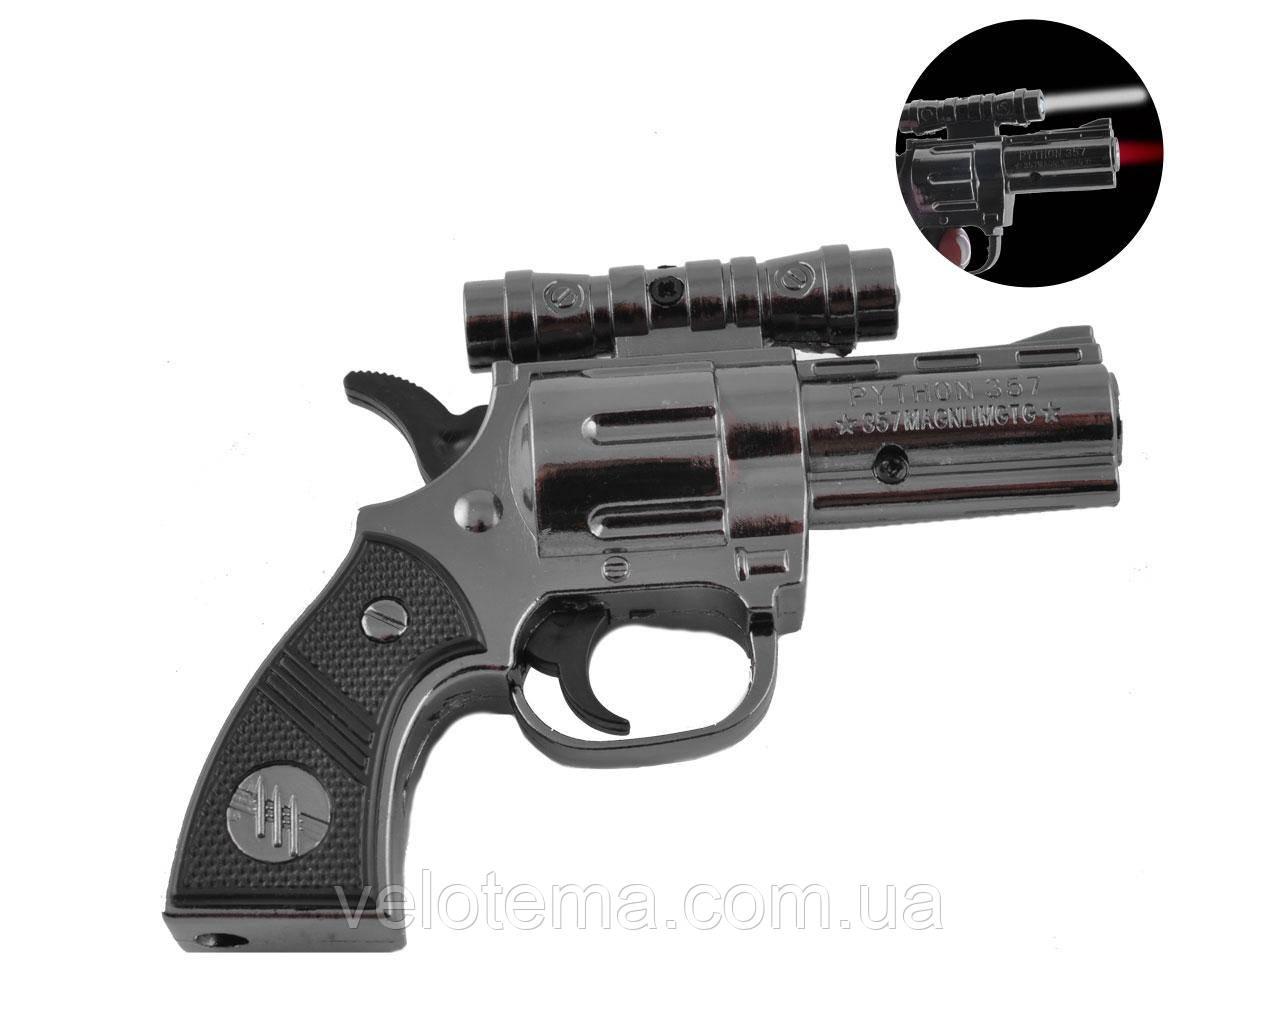 Газова запальничка пістолет Python 357 (Турбо полум'я, Ліхтарик)